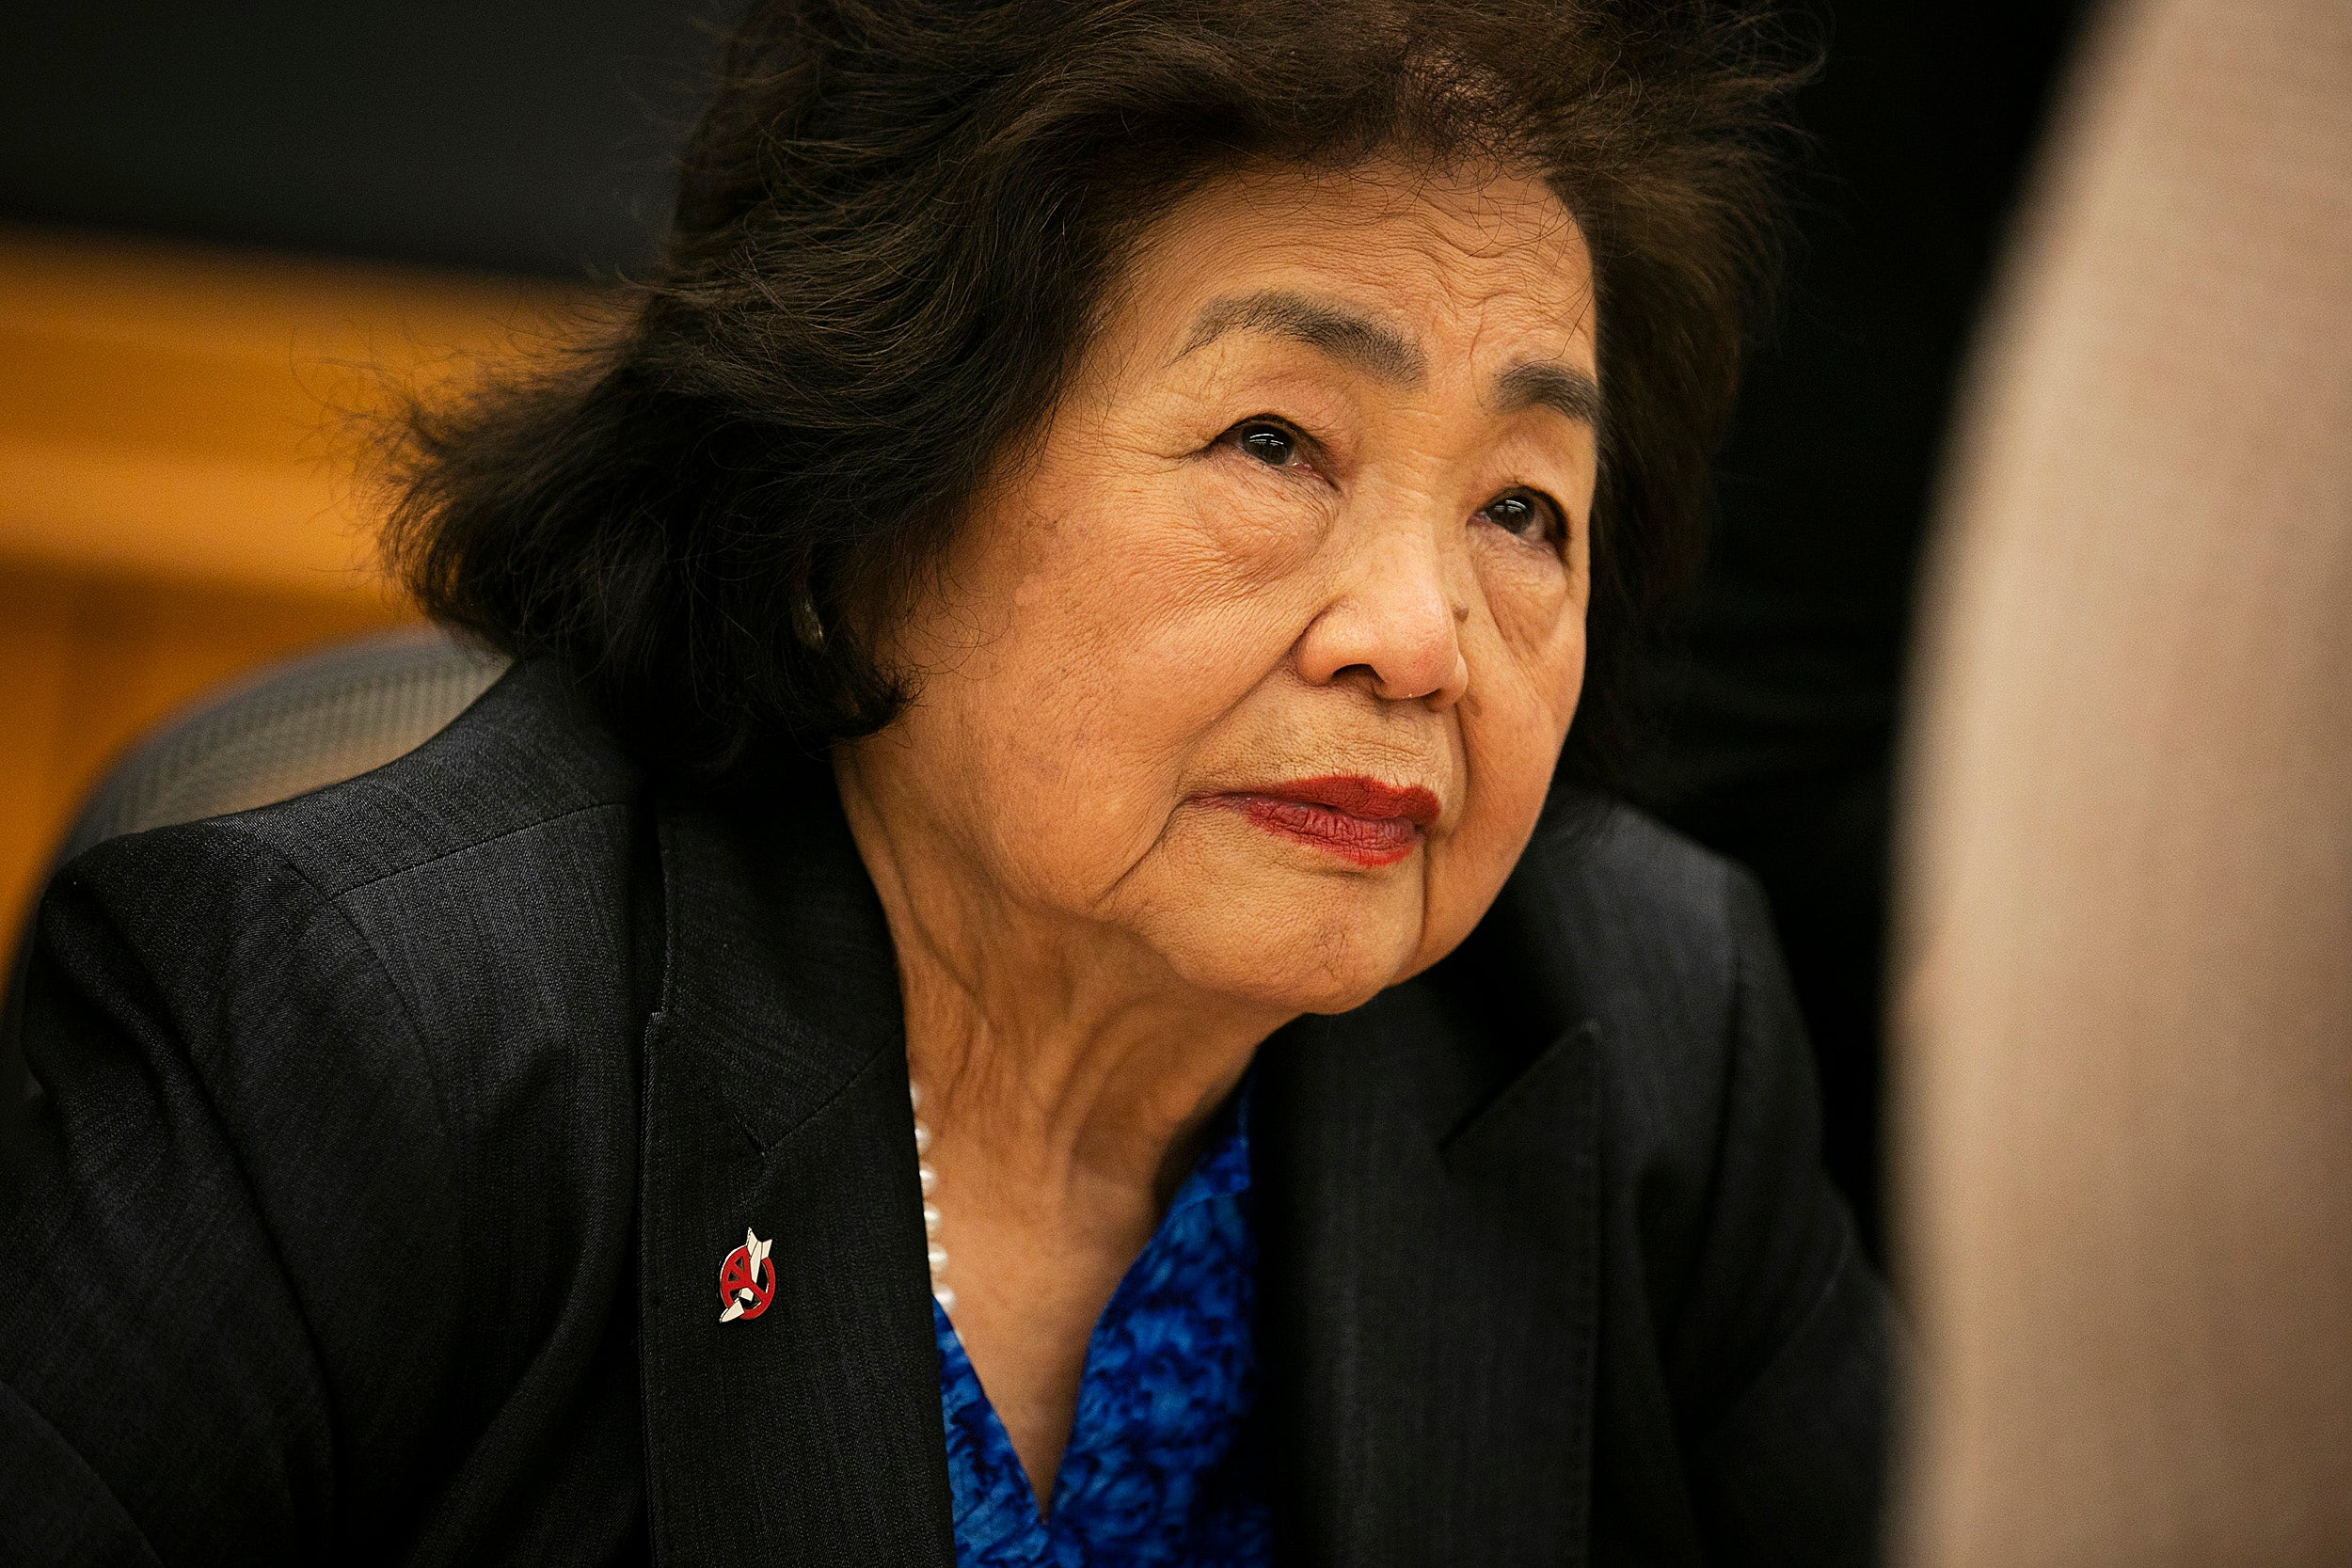 Setsuko Thurlow, a survivor of the Hiroshima nuclear bombing,